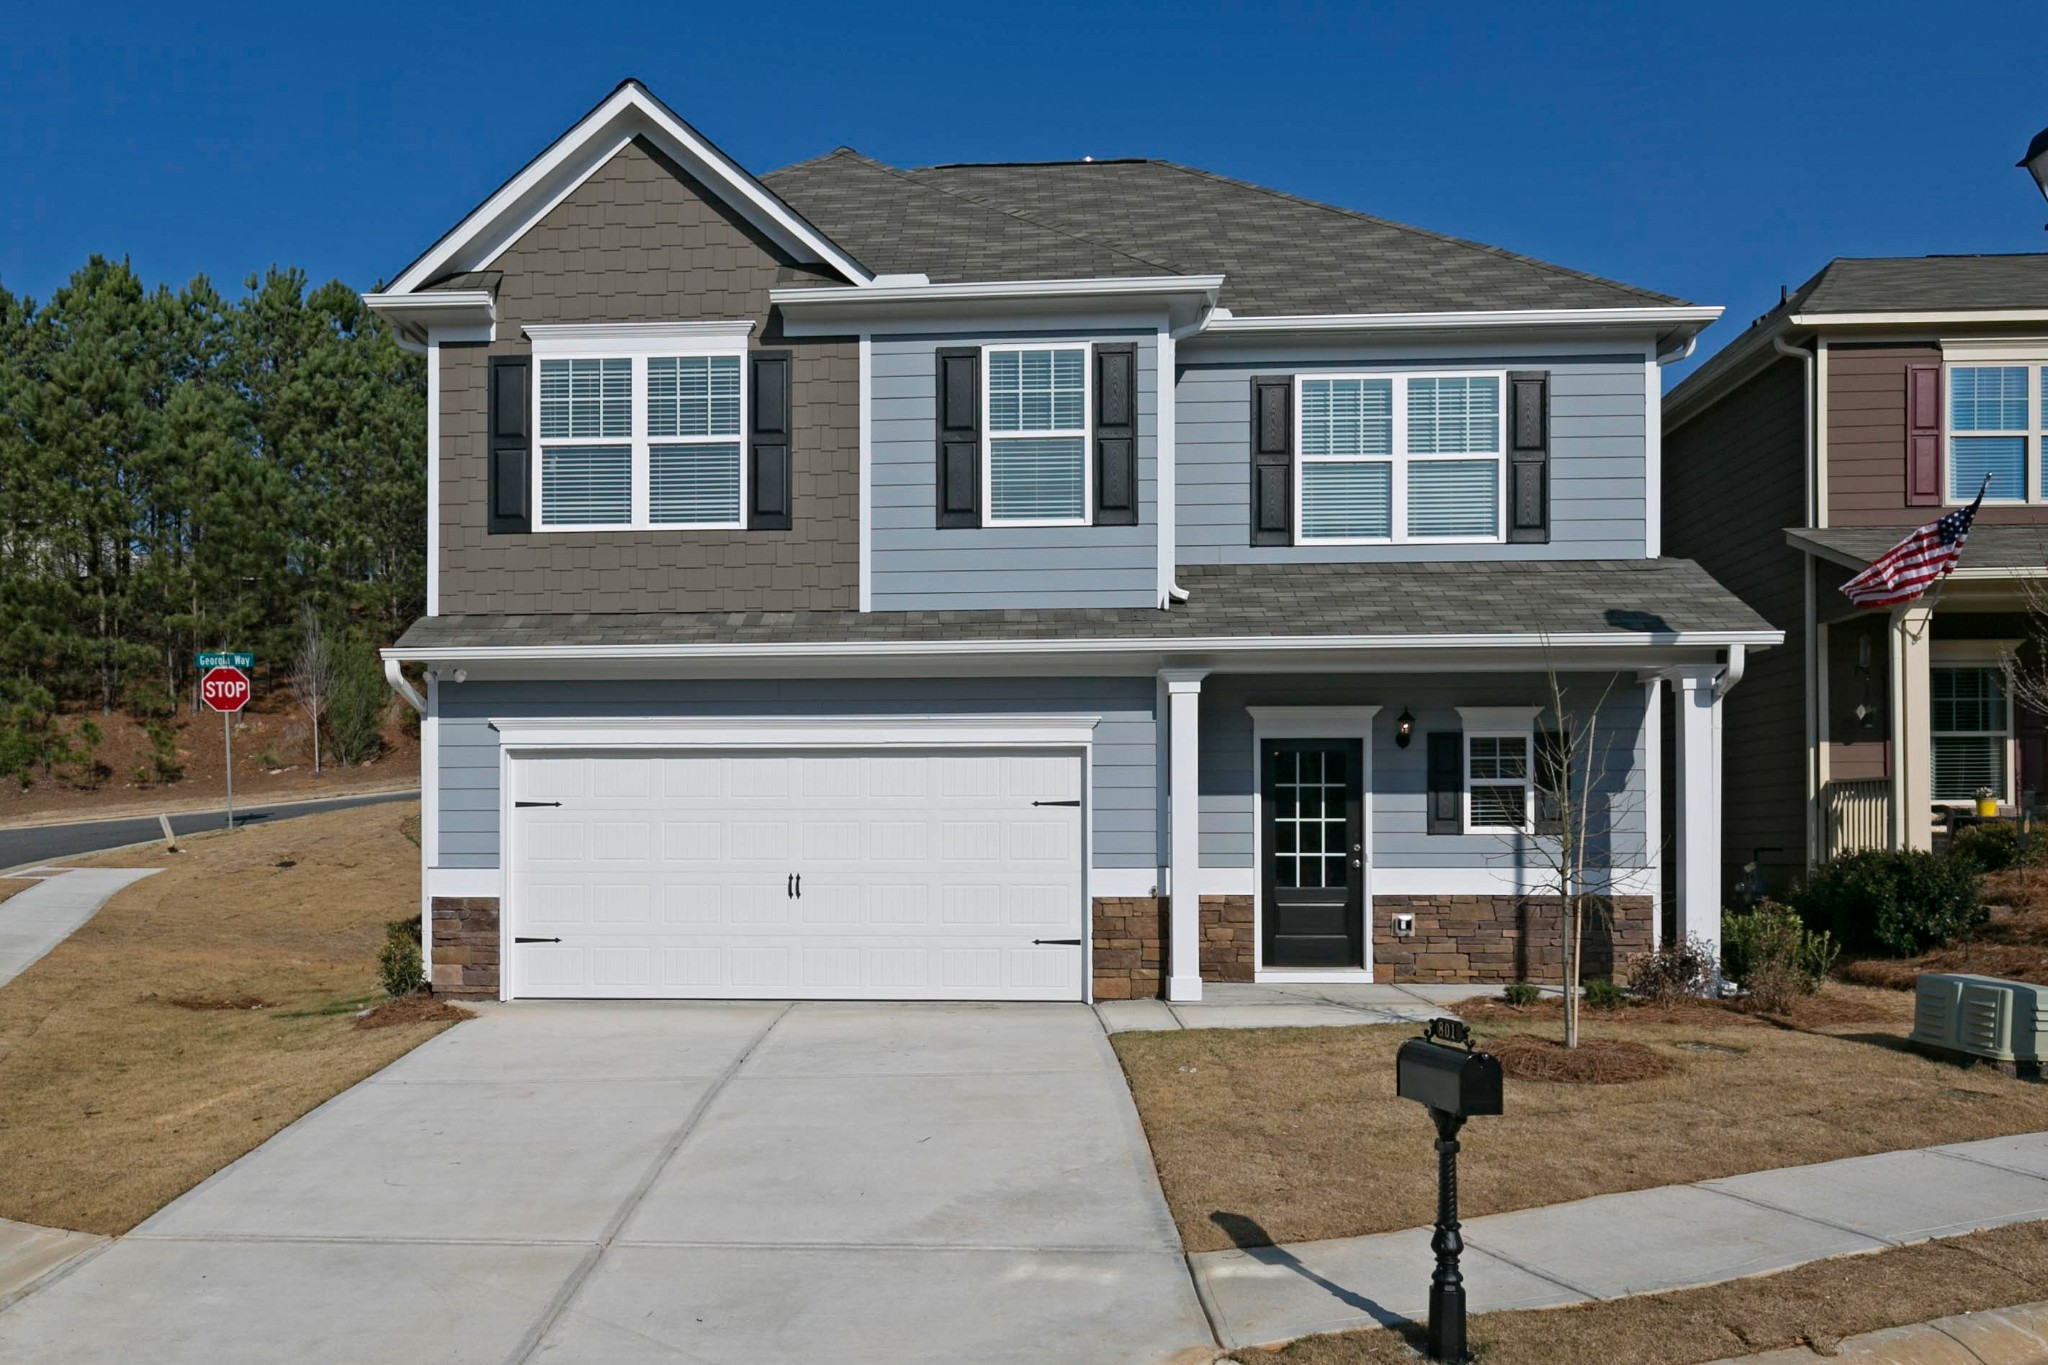 121 Petunia Drive, Smyrna, TN 37167 - Smyrna, TN real estate listing